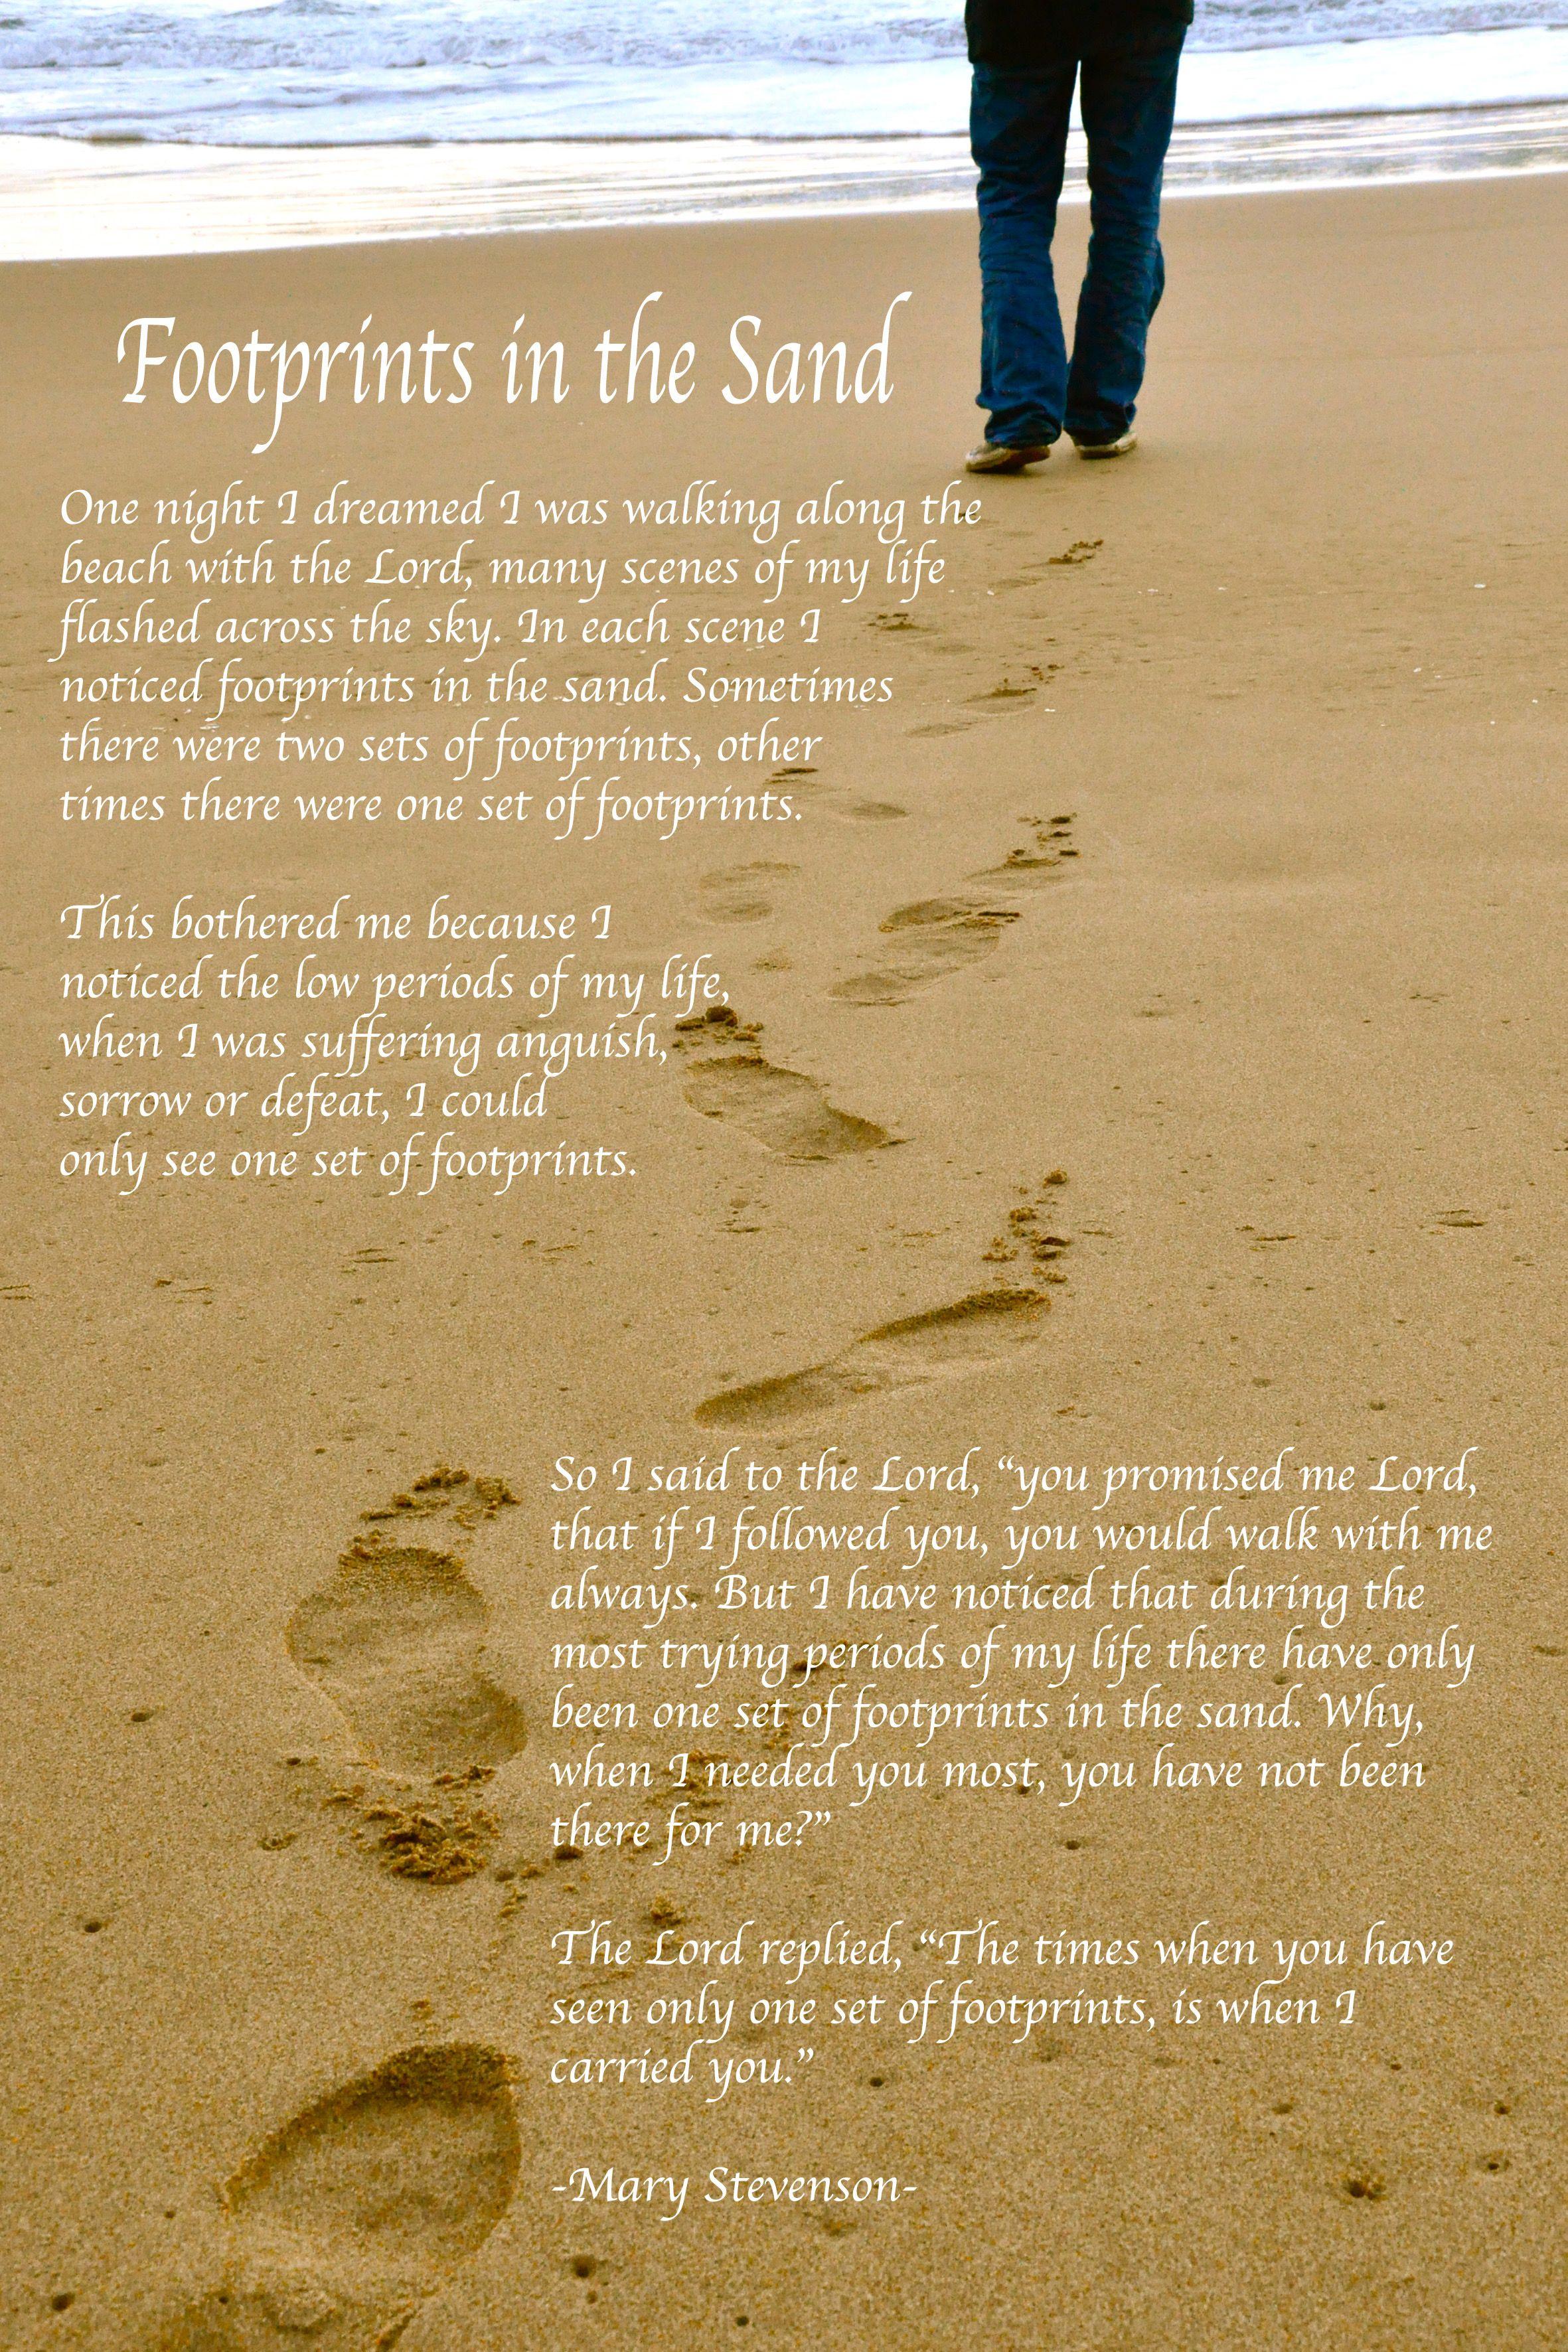 graphic regarding Footprints in the Sand Poem Printable known as Footprints in just the sand bible verse